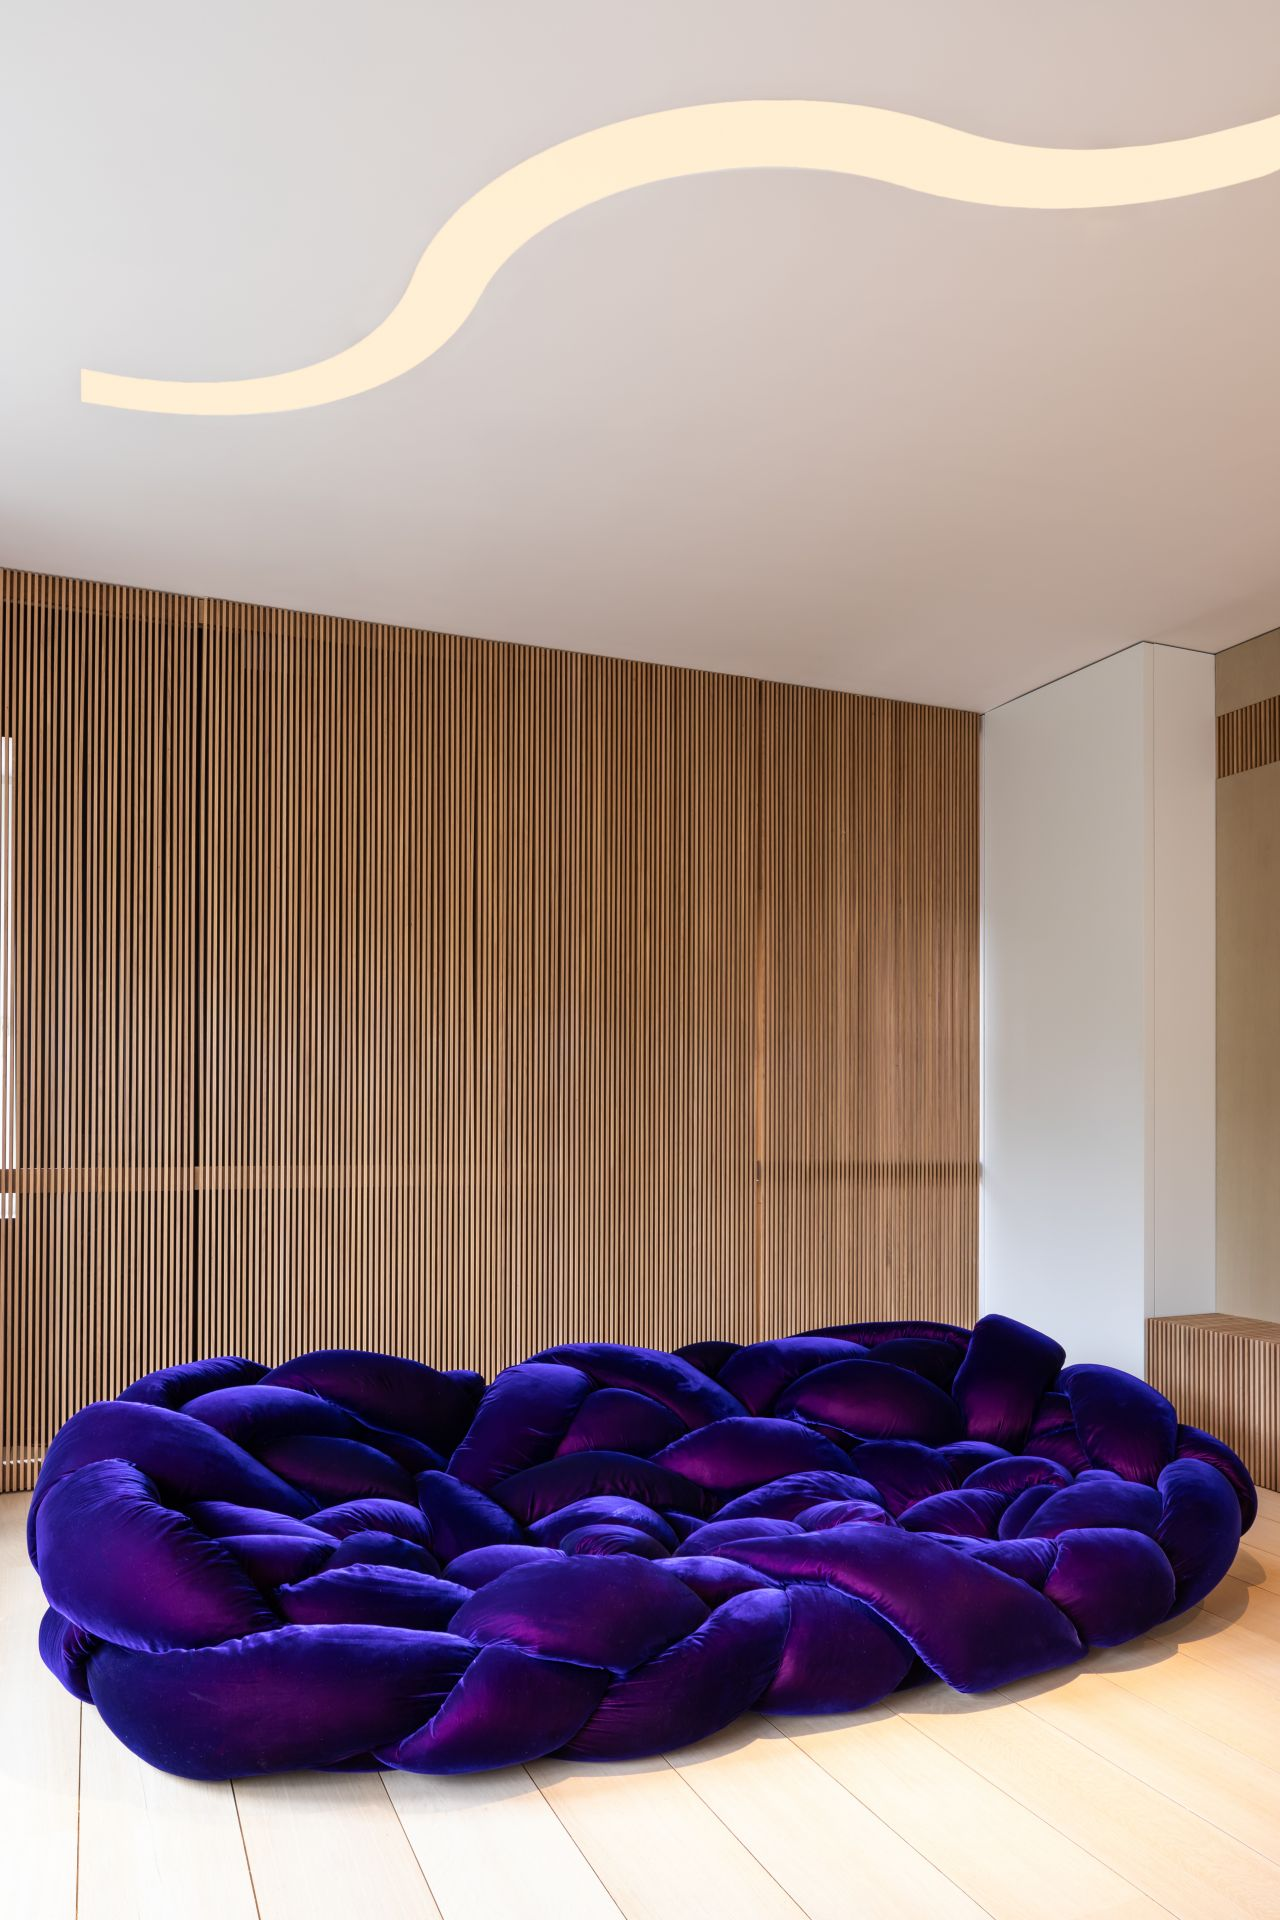 Appartamento ad Anversa - image 9